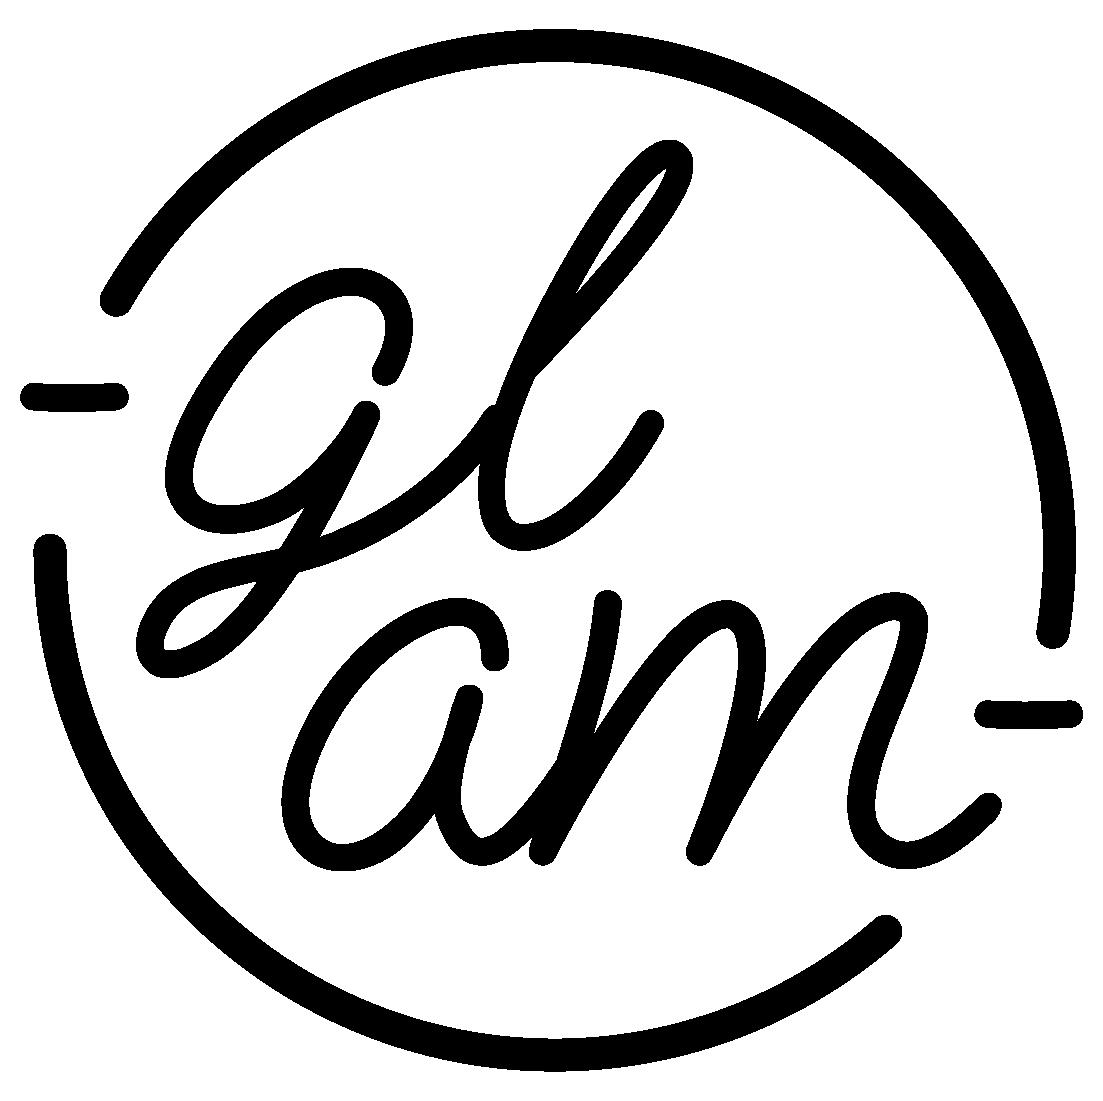 GL_GLAM_mark-logoblack gaslamp san diego